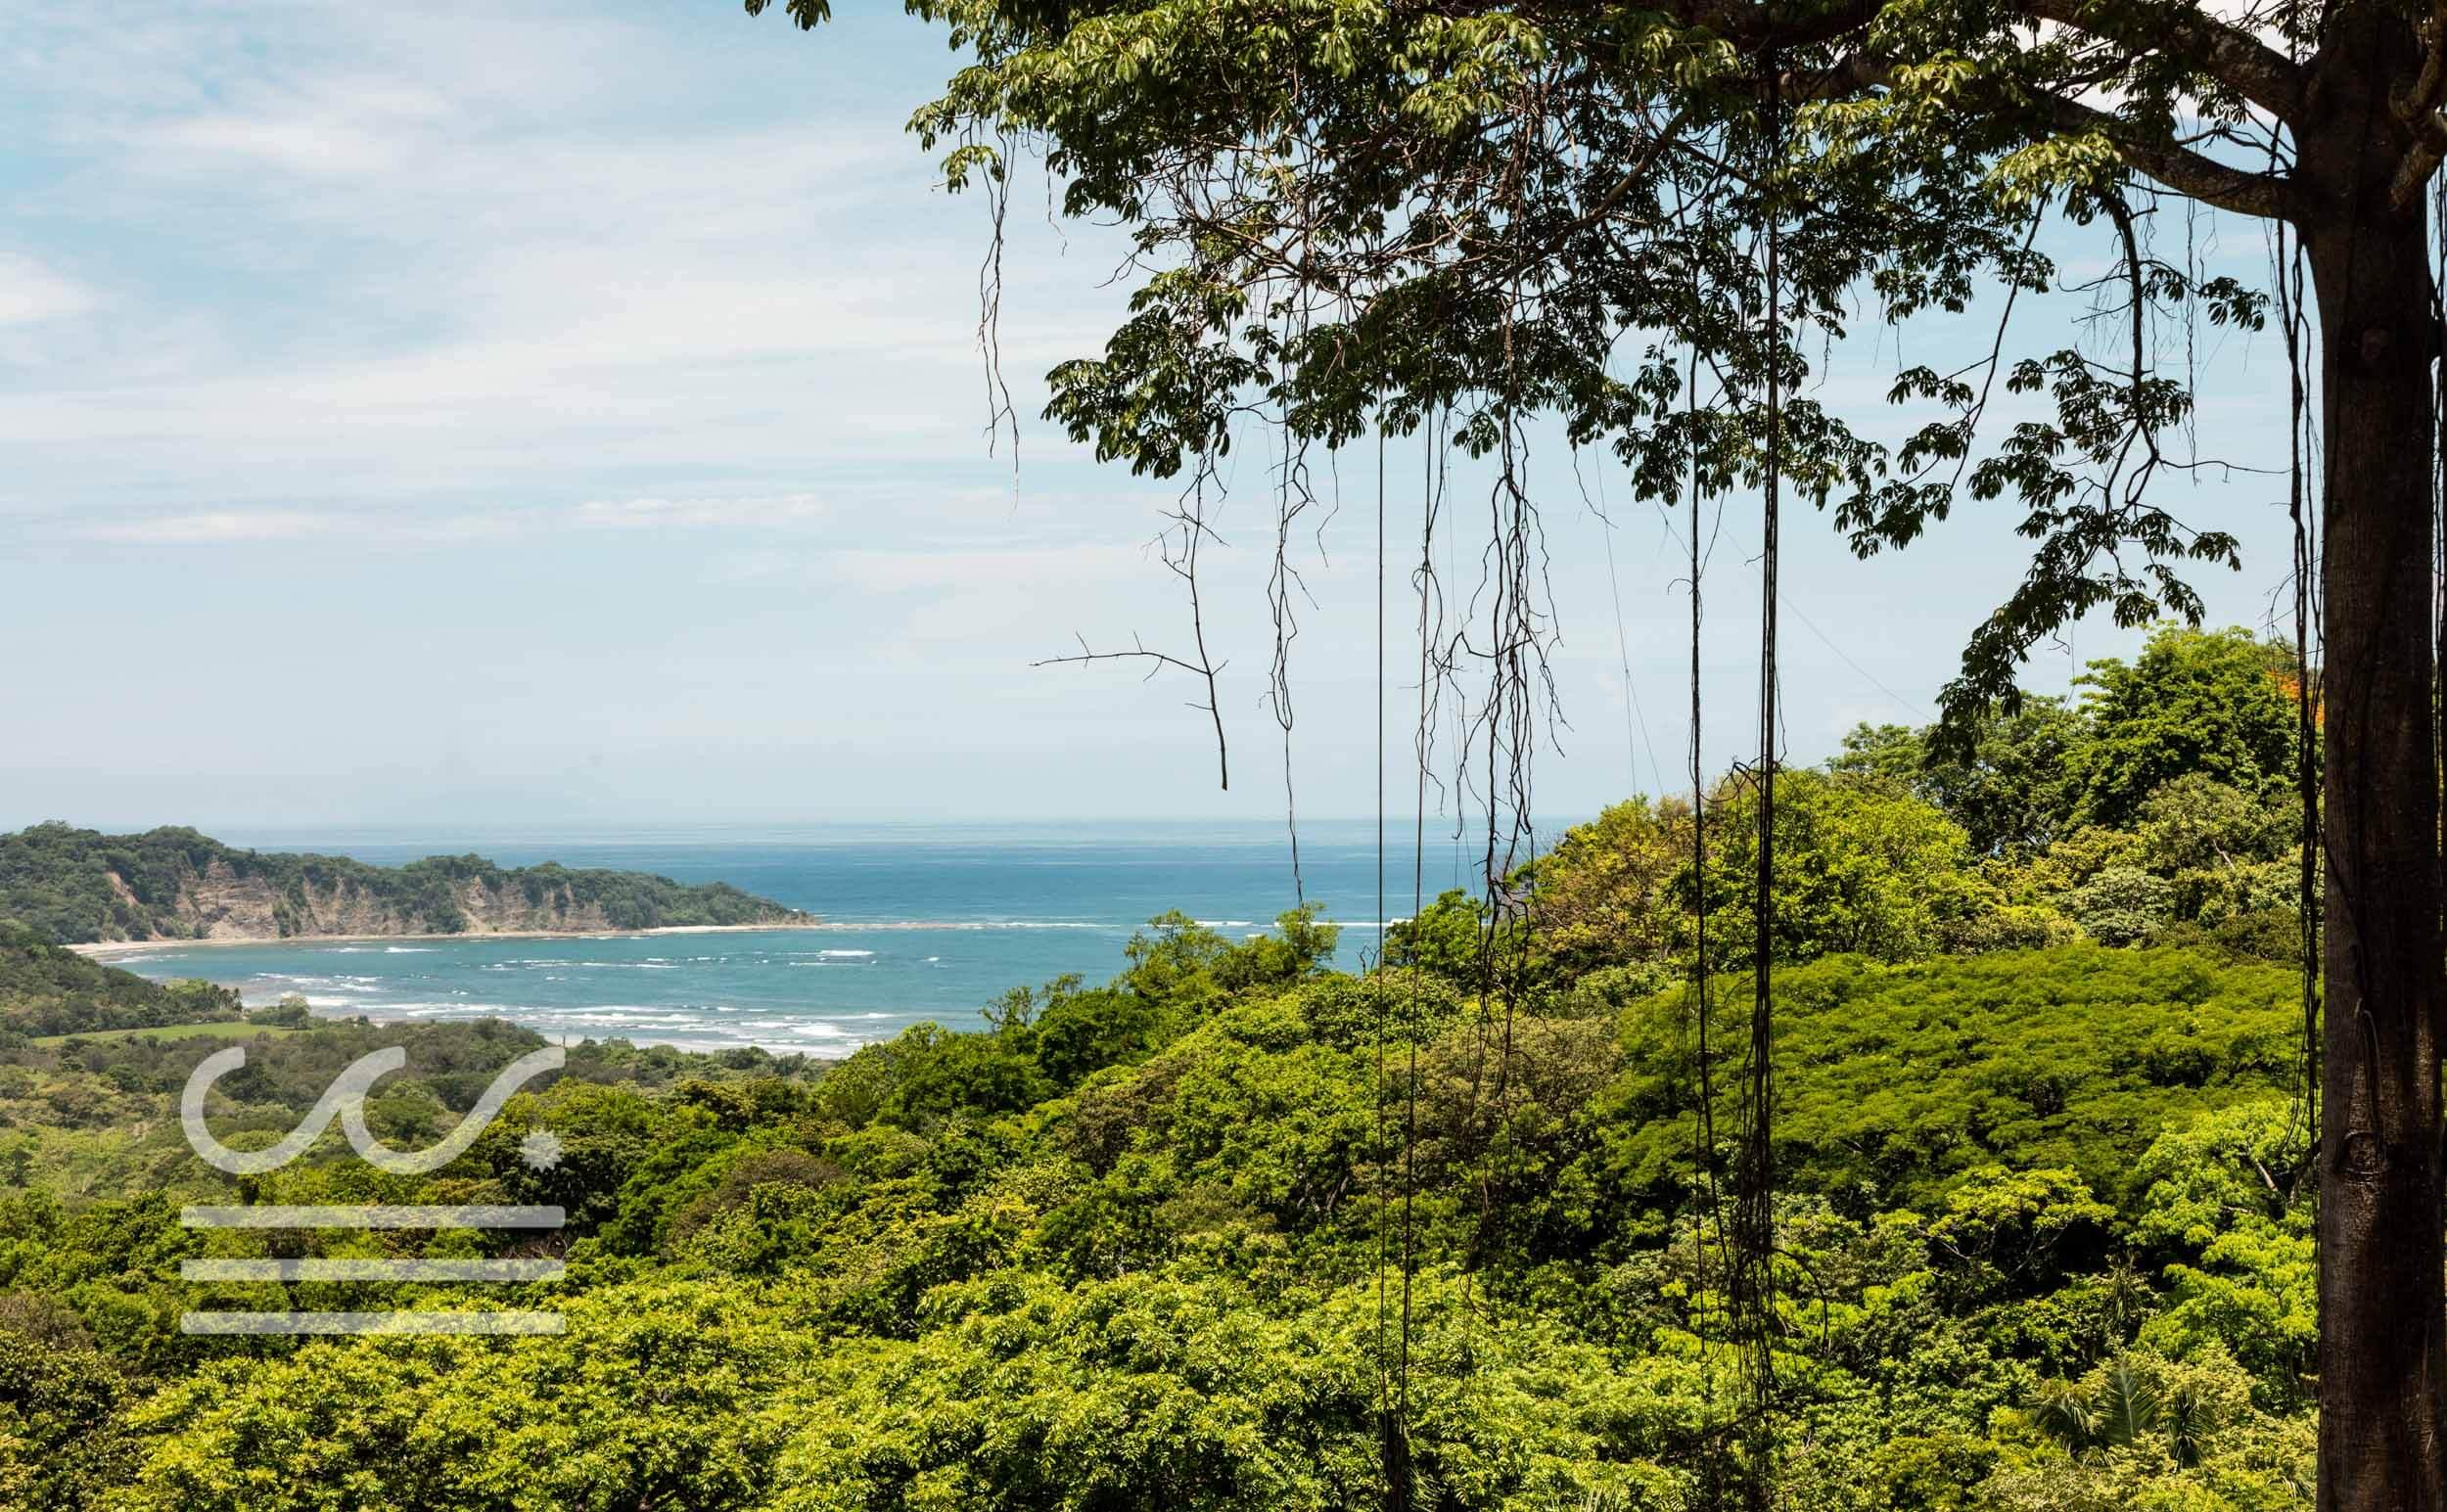 EE-101-Lot-Wanderlust-Realty-Real-Estate-Nosara-Costa-Rica-3compressed.jpg